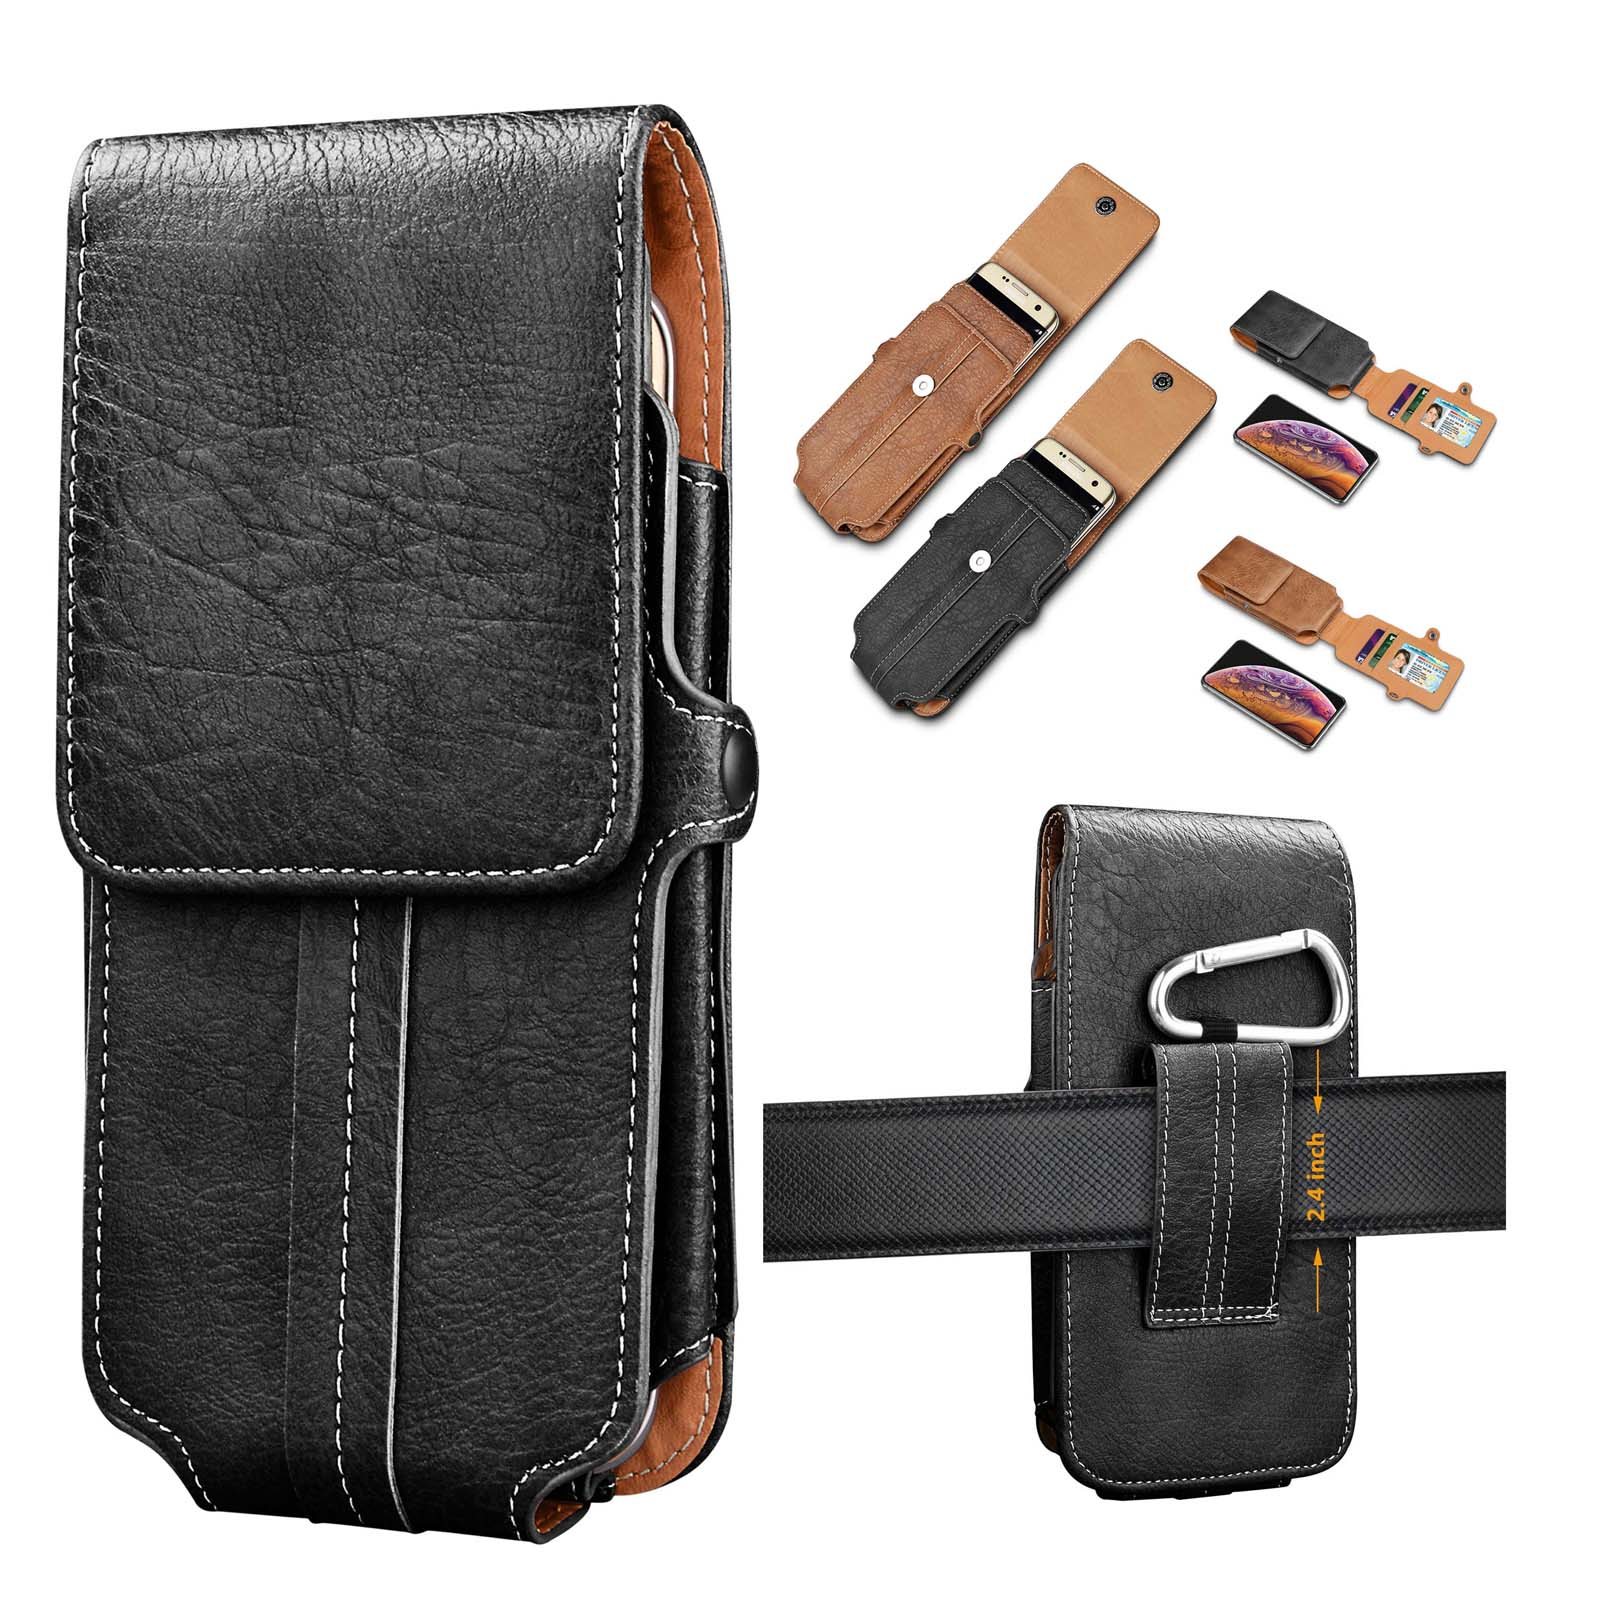 :iPhone 6 6s 7 Plus Vertical Leather Belt Case Clip